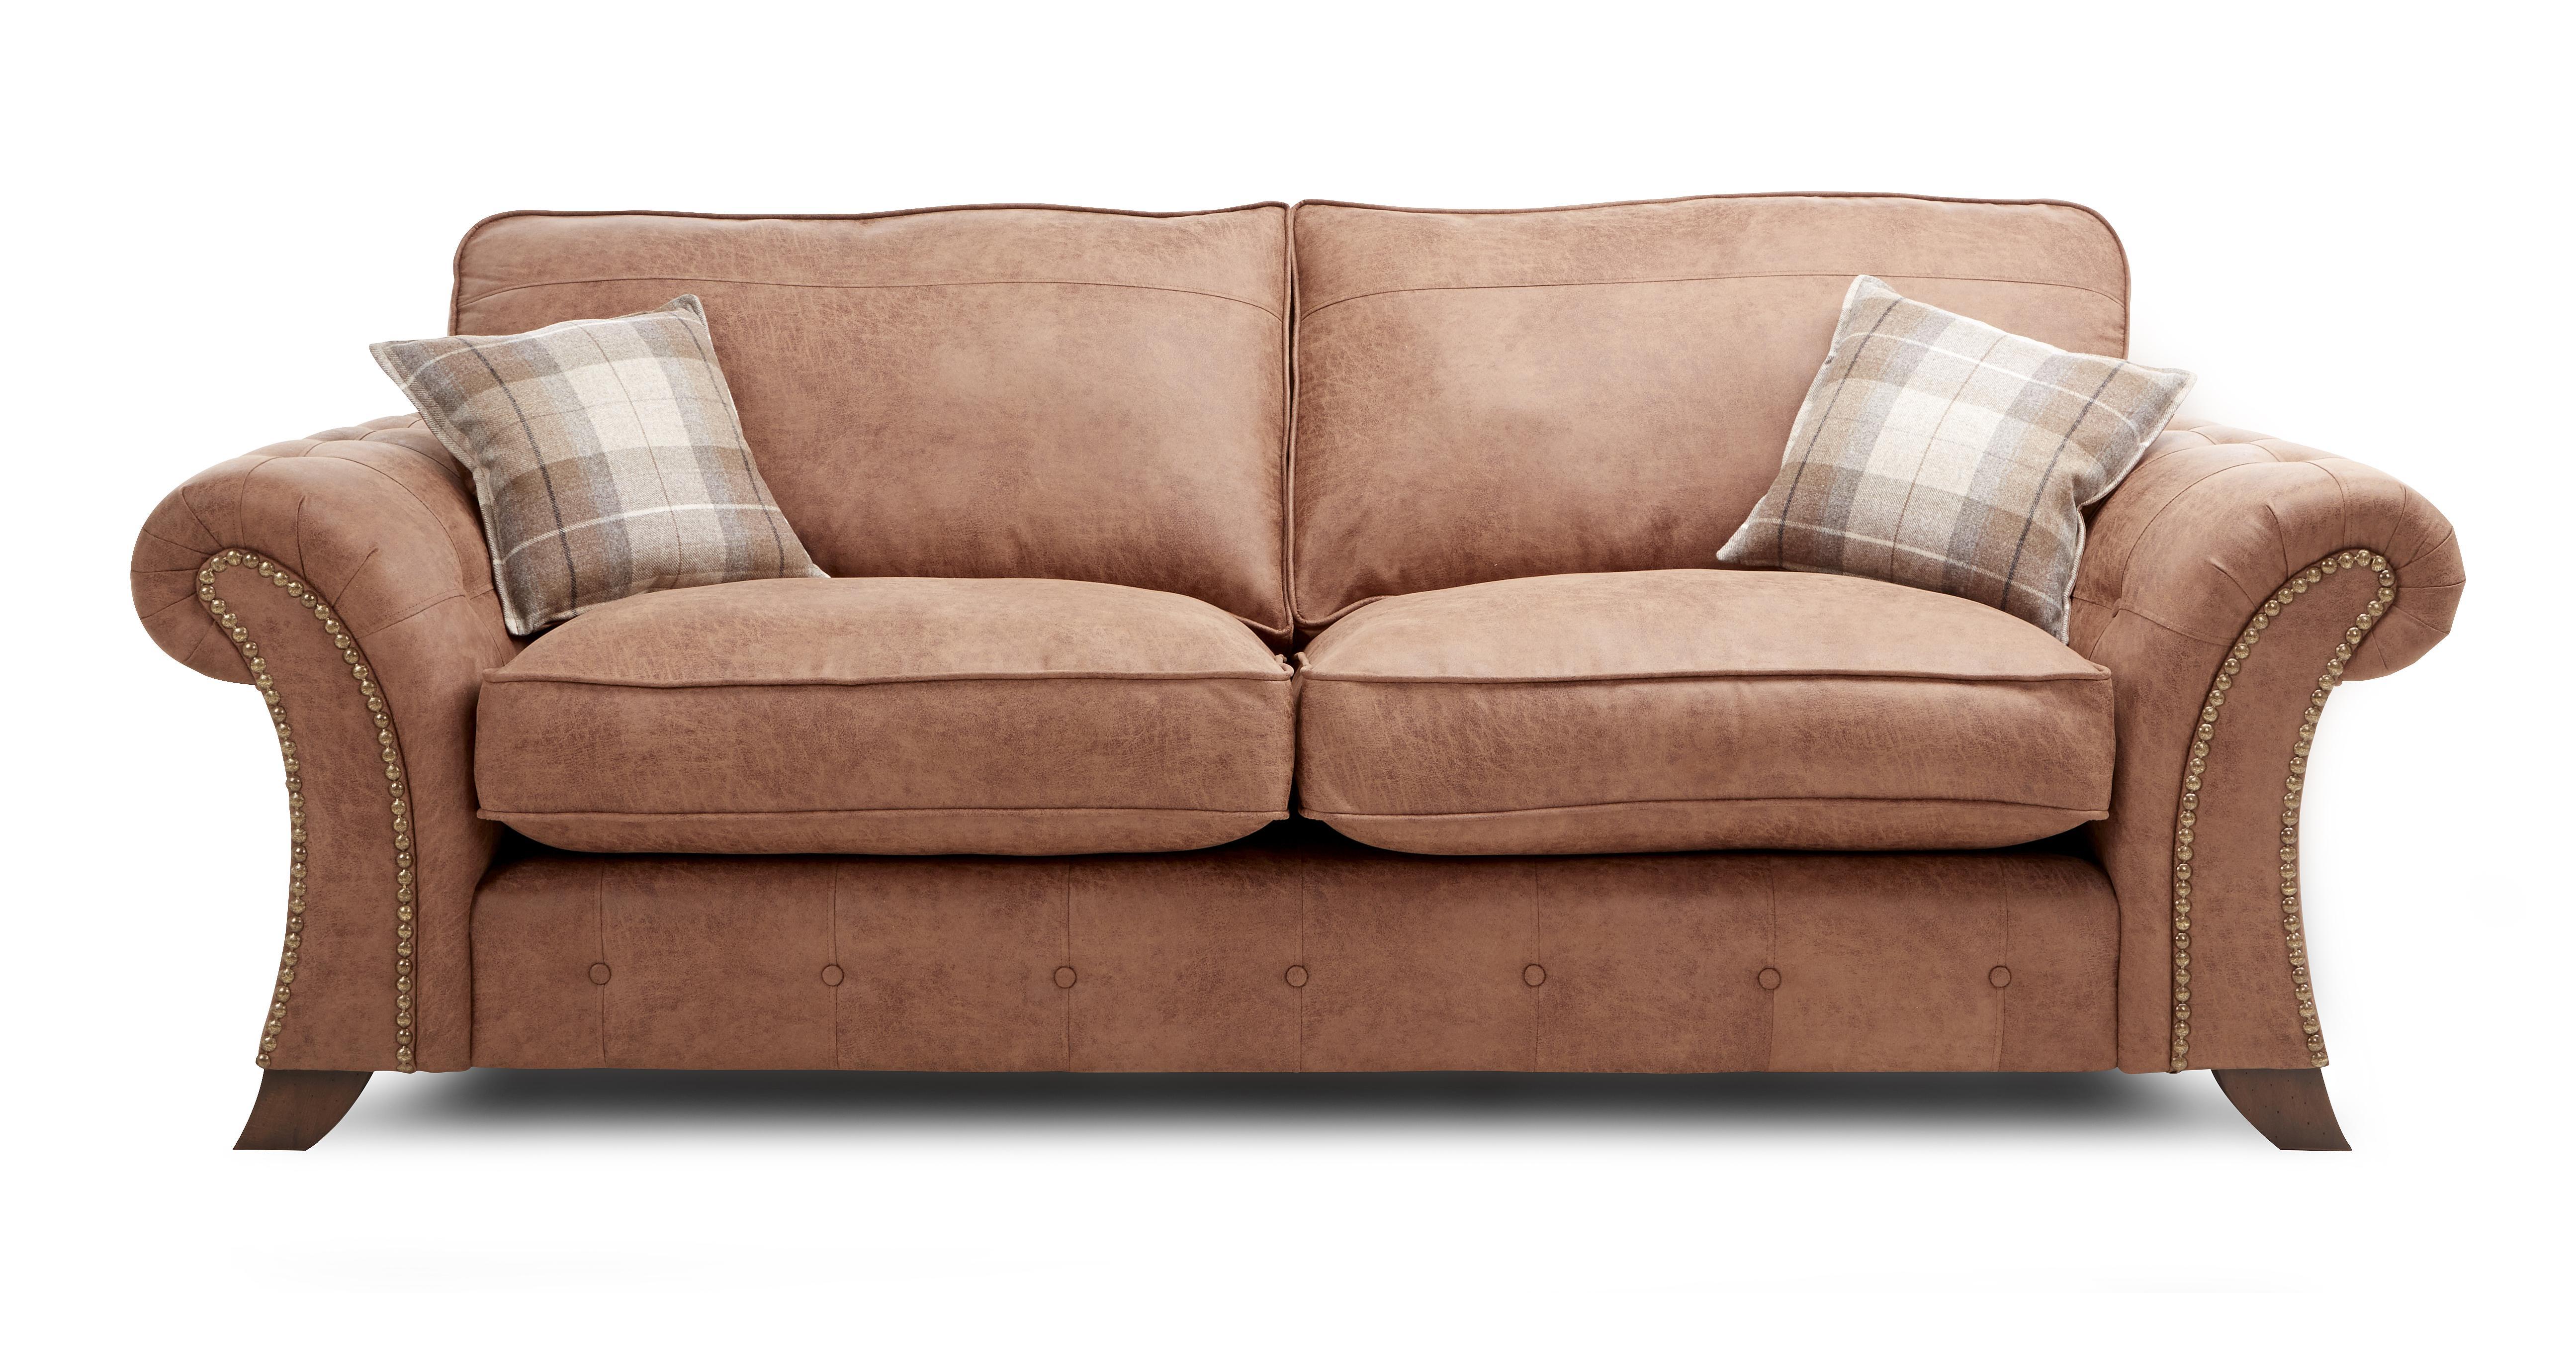 Woodland Express: 3 Seater Formal Back Sofa